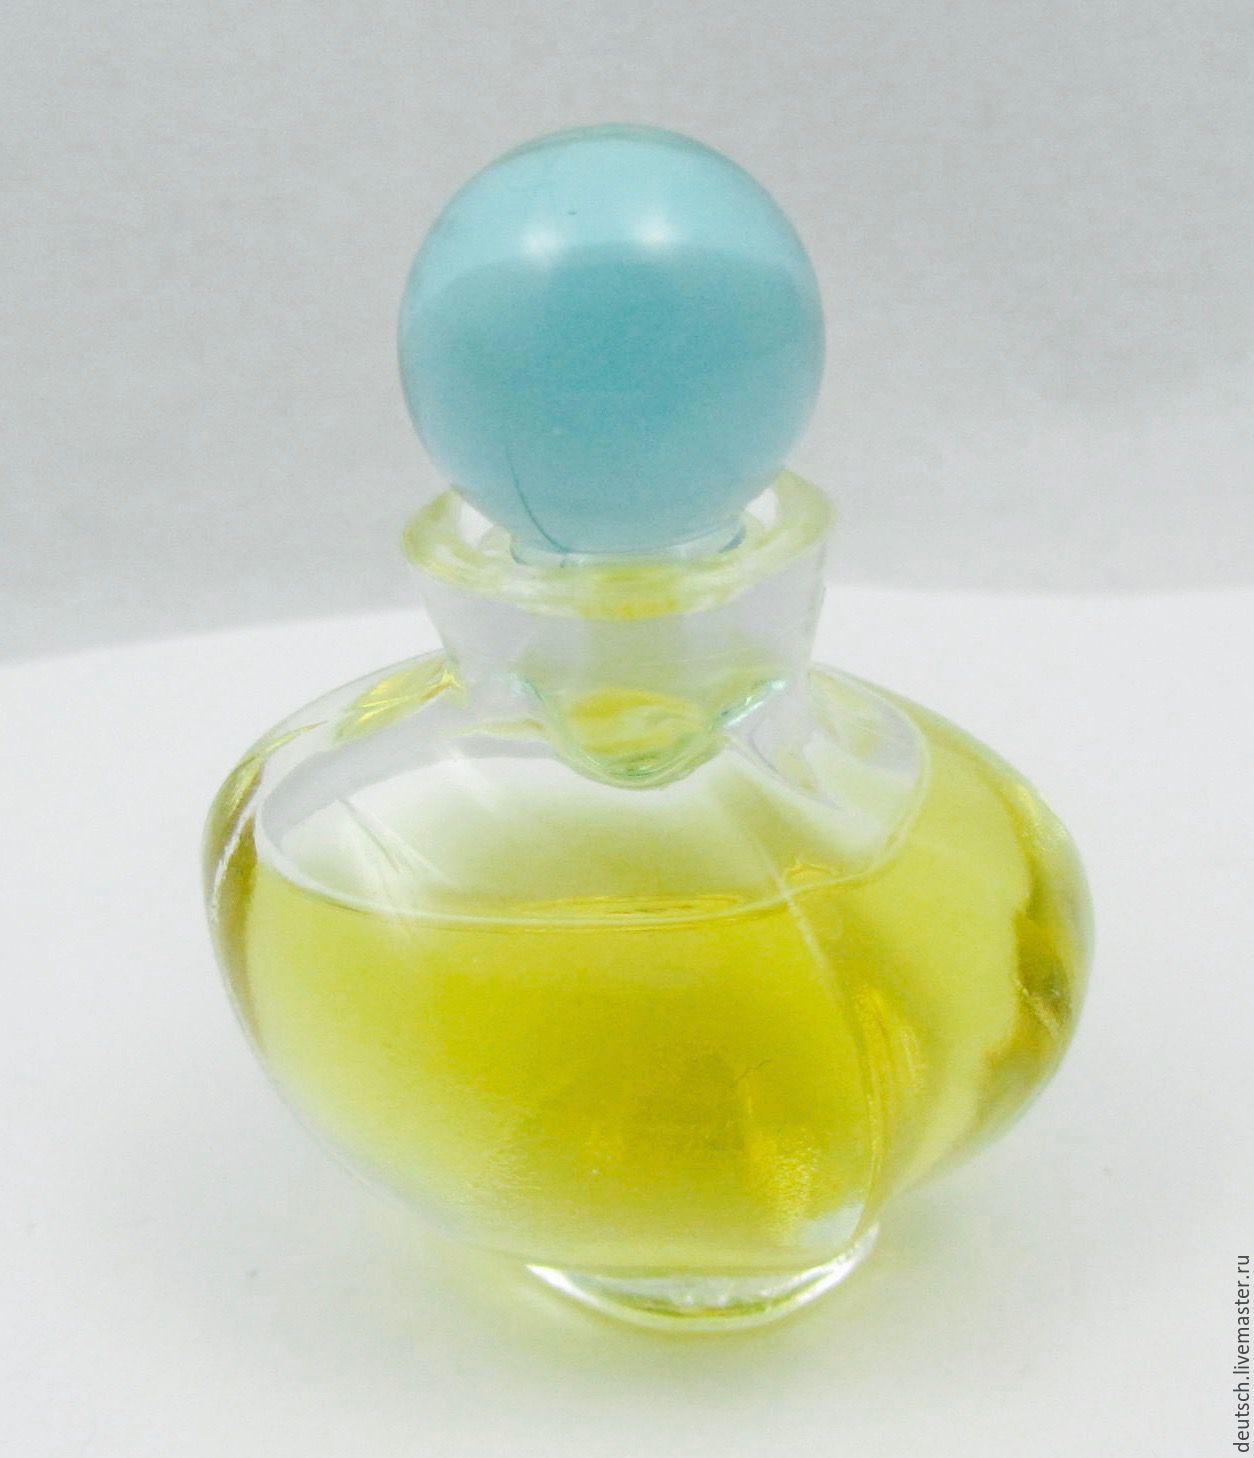 Винтаж: Wings Giorgio Beverly Hills 3.7  едт винтажный парфюм миниатюра, Винтажные предметы интерьера, Гамбург, Фото №1